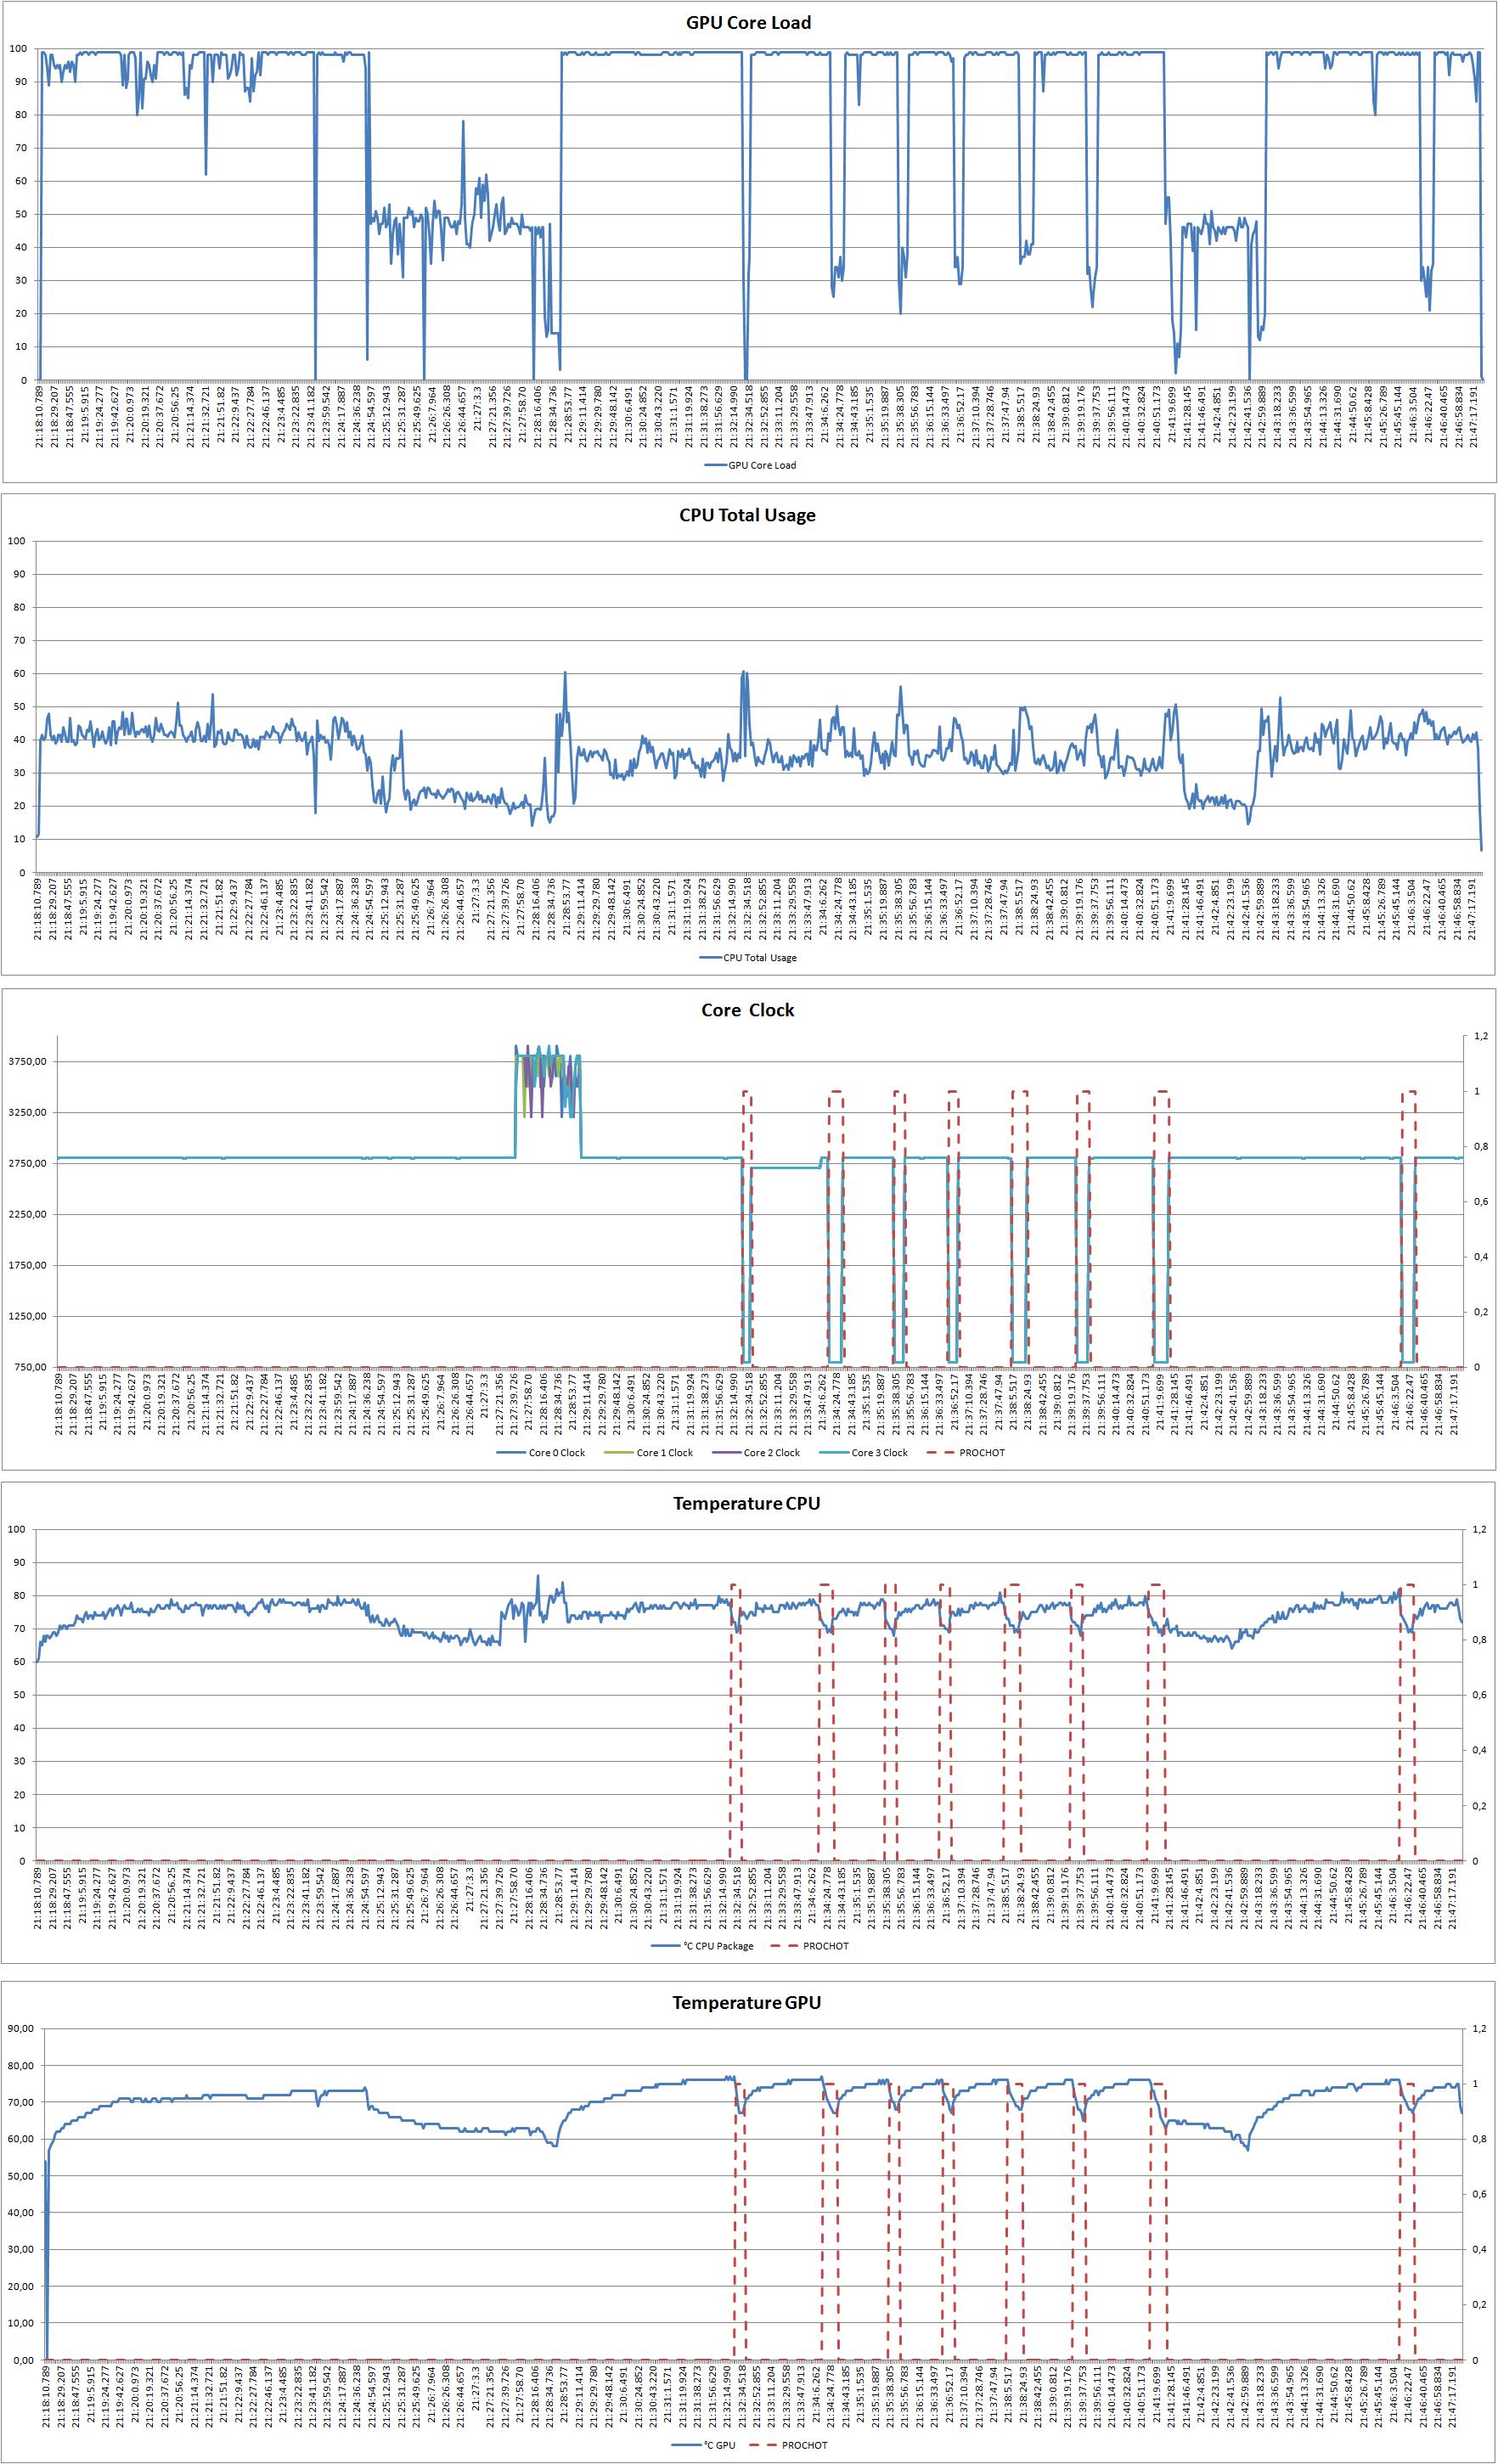 Alienware 17 R2] Alienware 17 R2 Temperatur Probleme - Seite